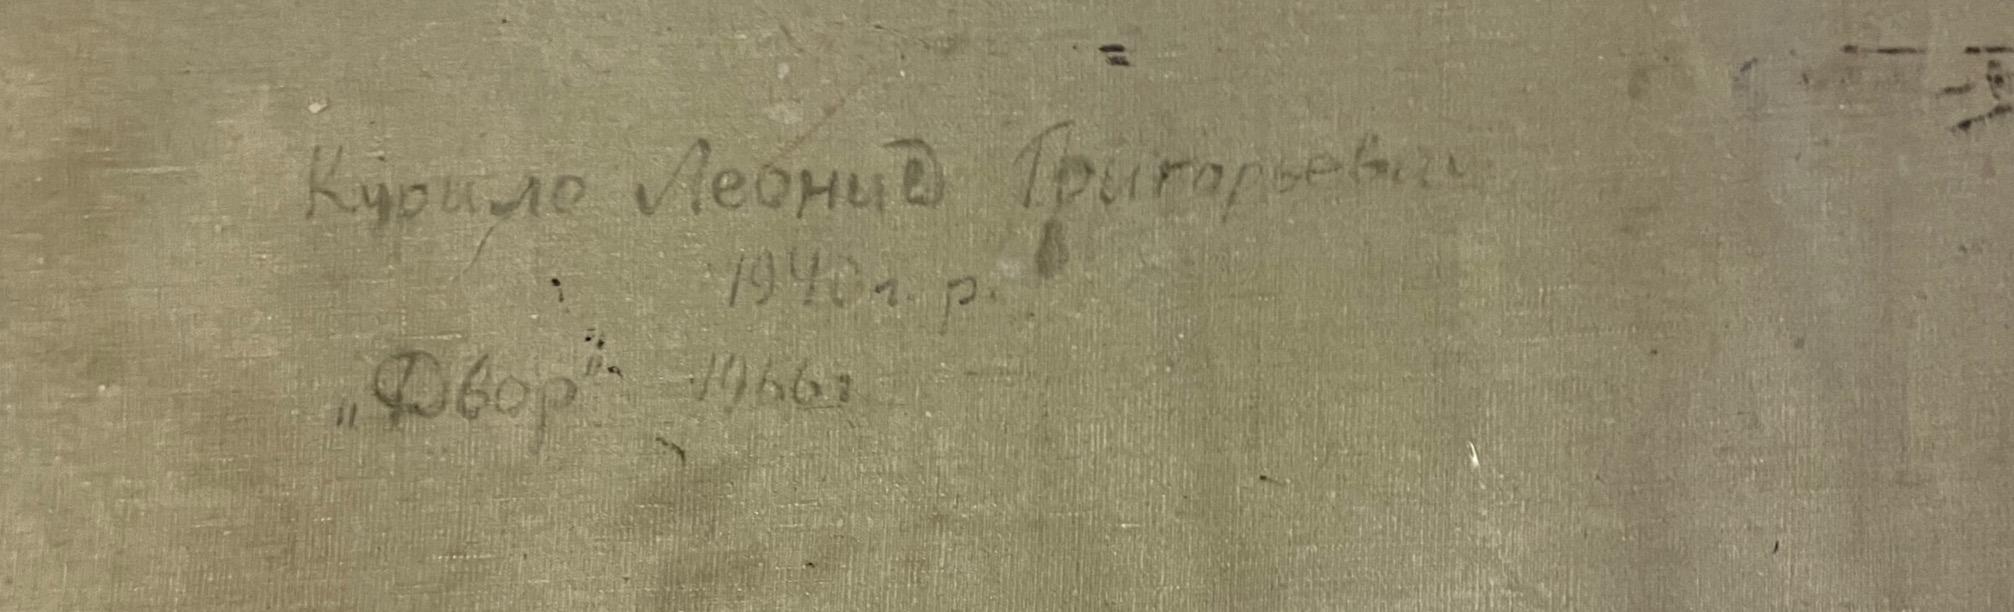 Курило Леонид Григорьевич. Двор